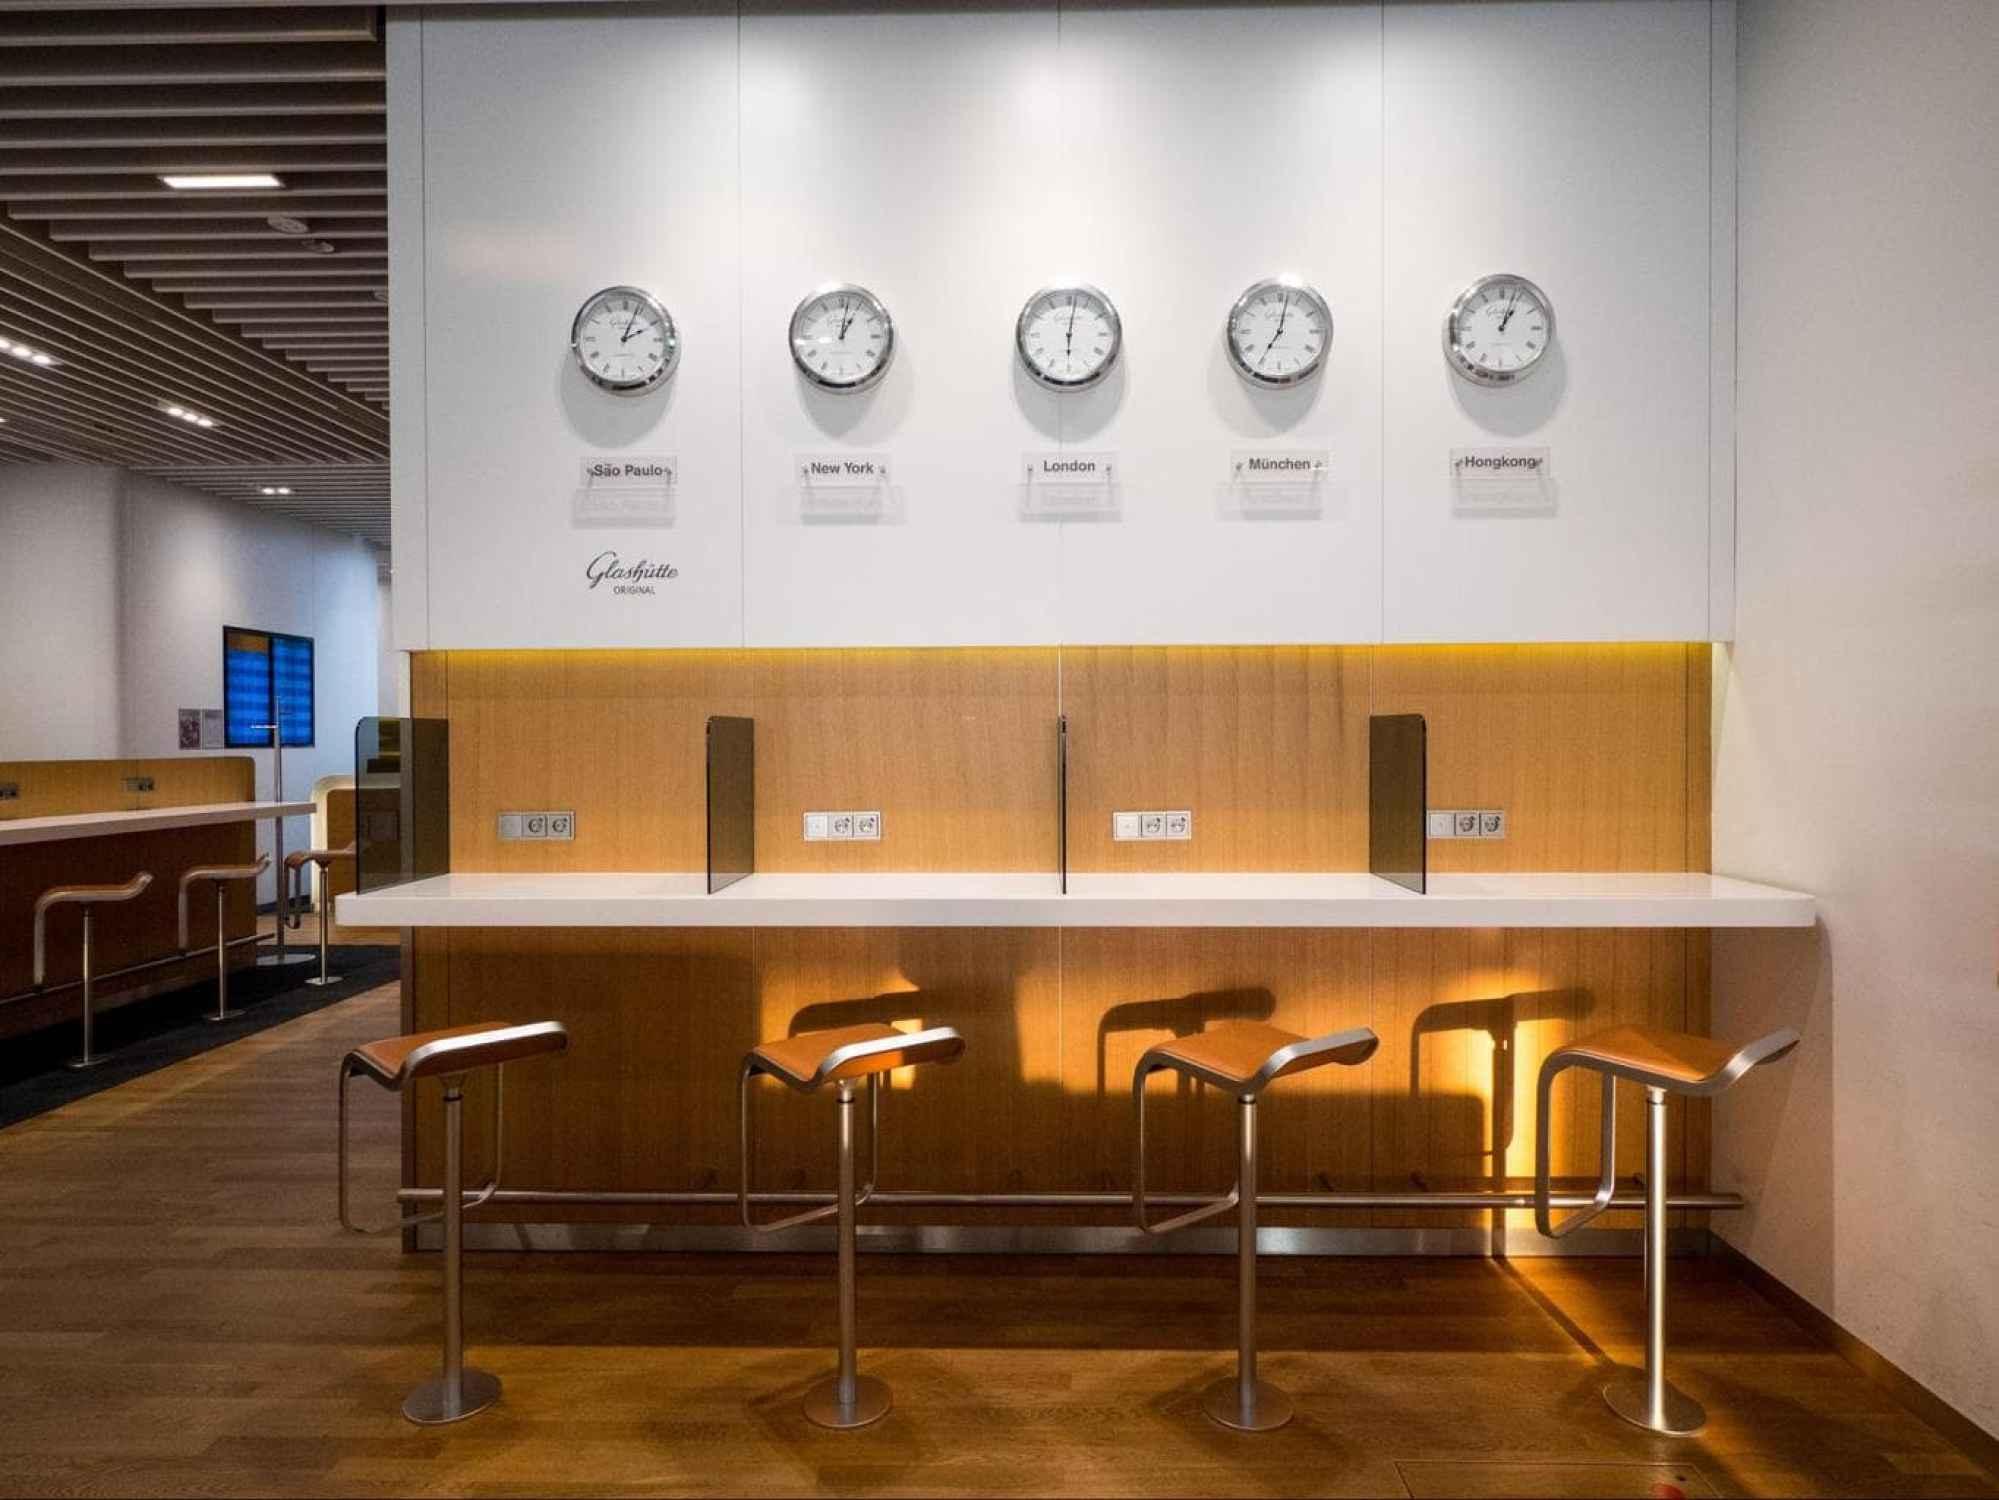 Working desks in Lufthansa Business Class Lounge at Munich Airport